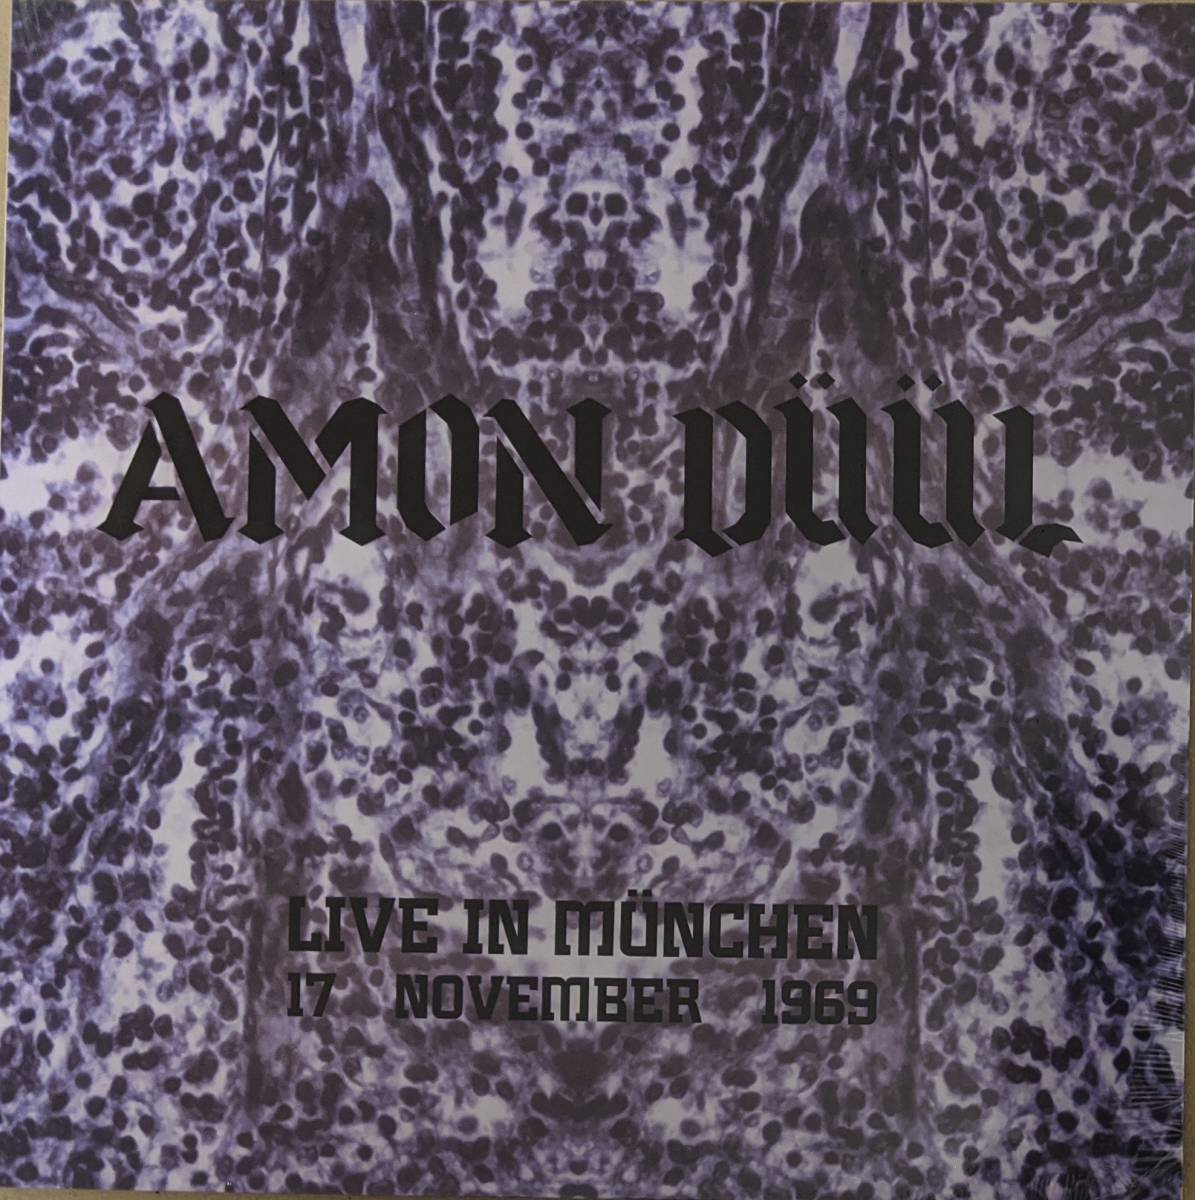 Amon Duul - Live in Munchen - 17 November 1969 限定アナログ・レコード